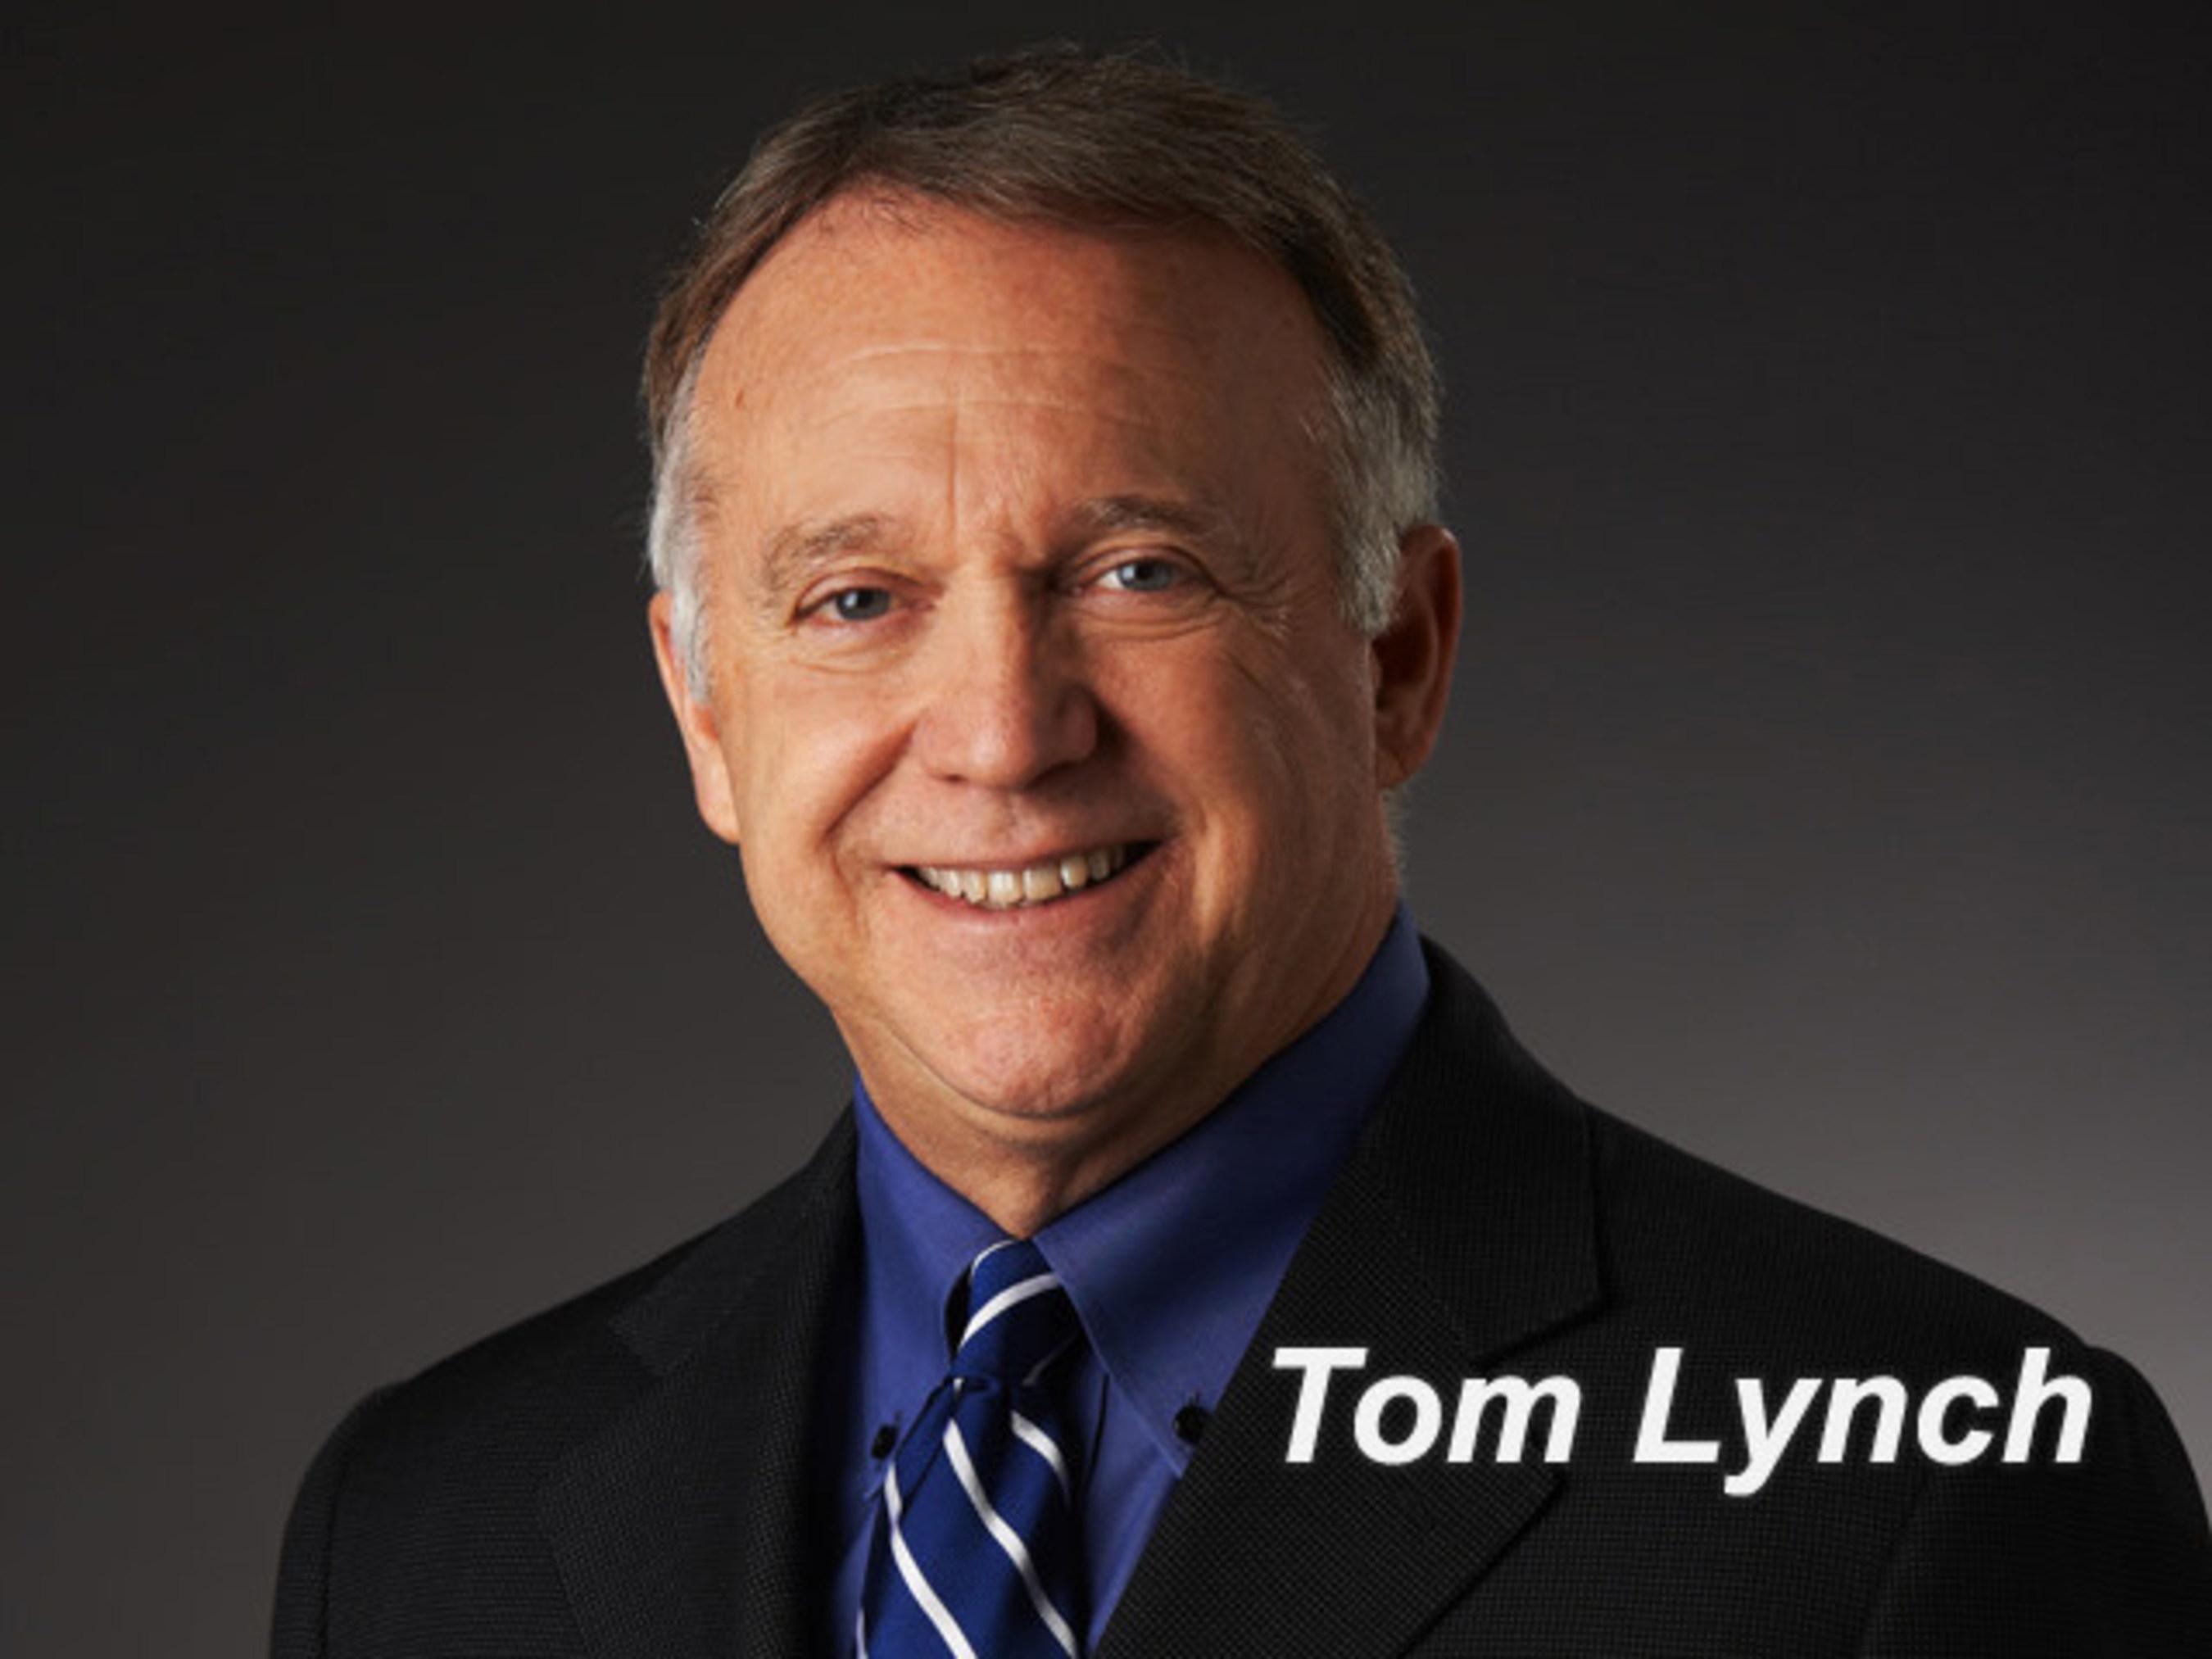 Tom Lynch, Chairman & CEO